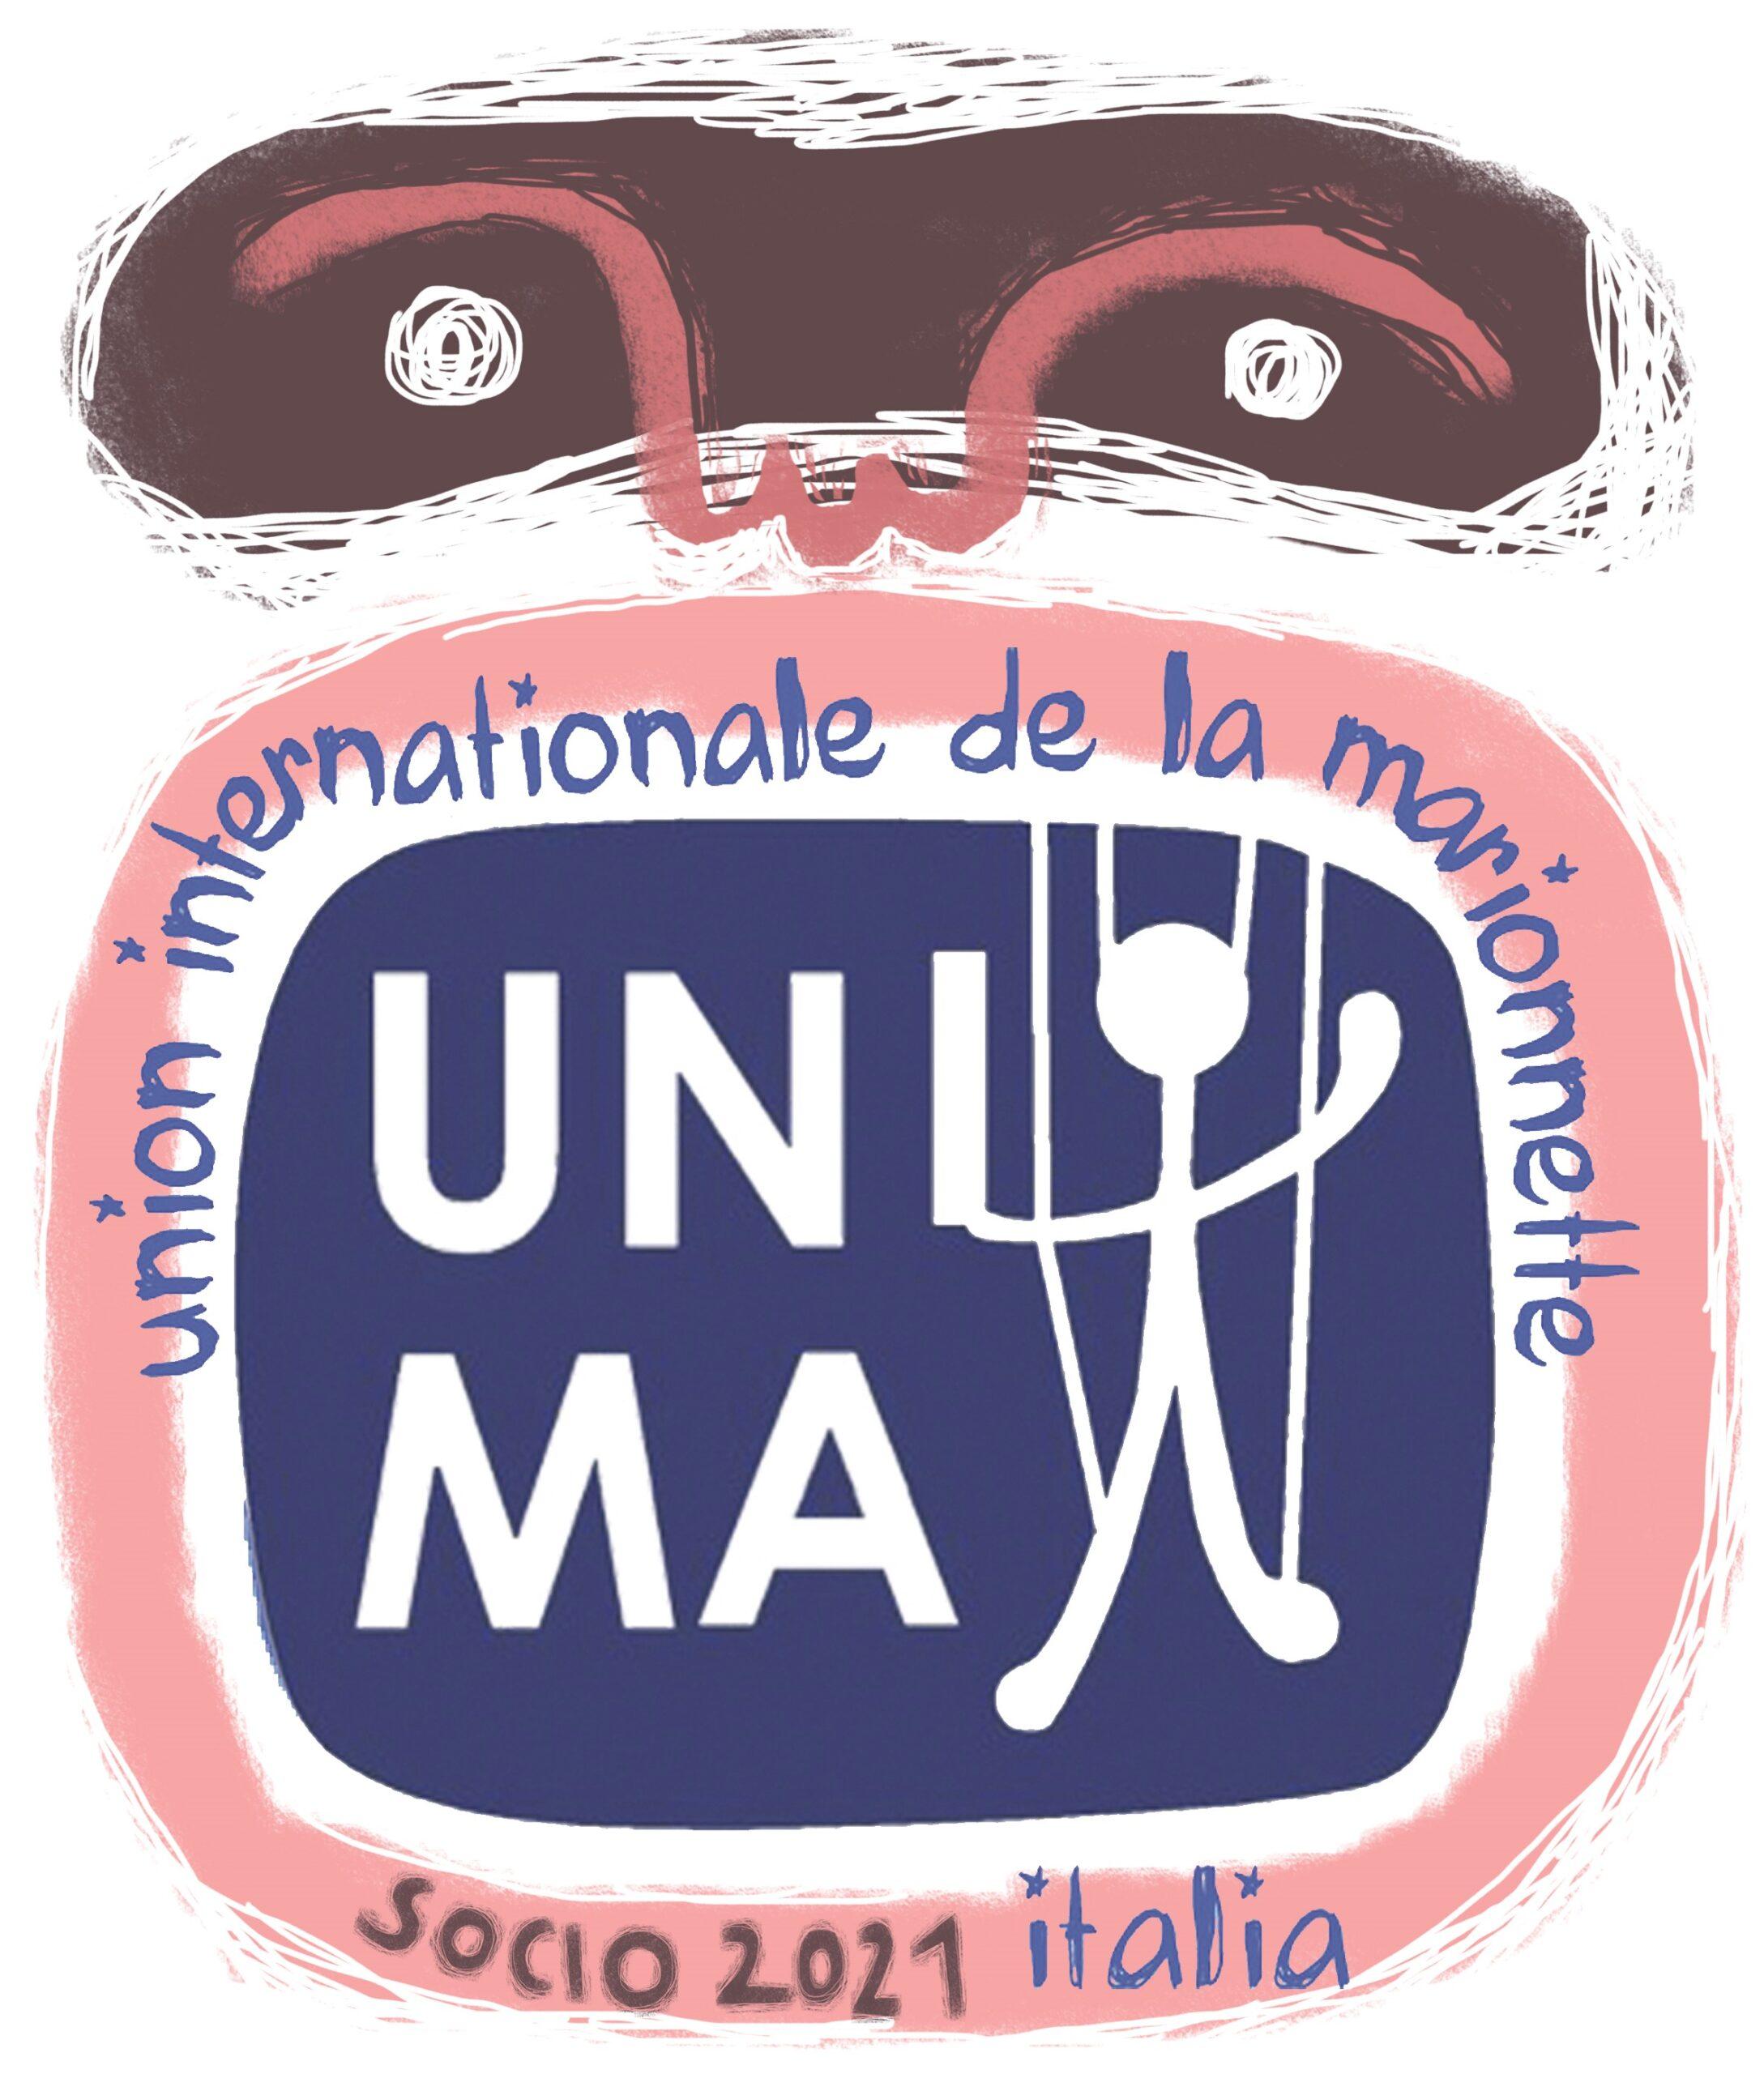 Soci-UNIMA-Italia-2021-890×1024